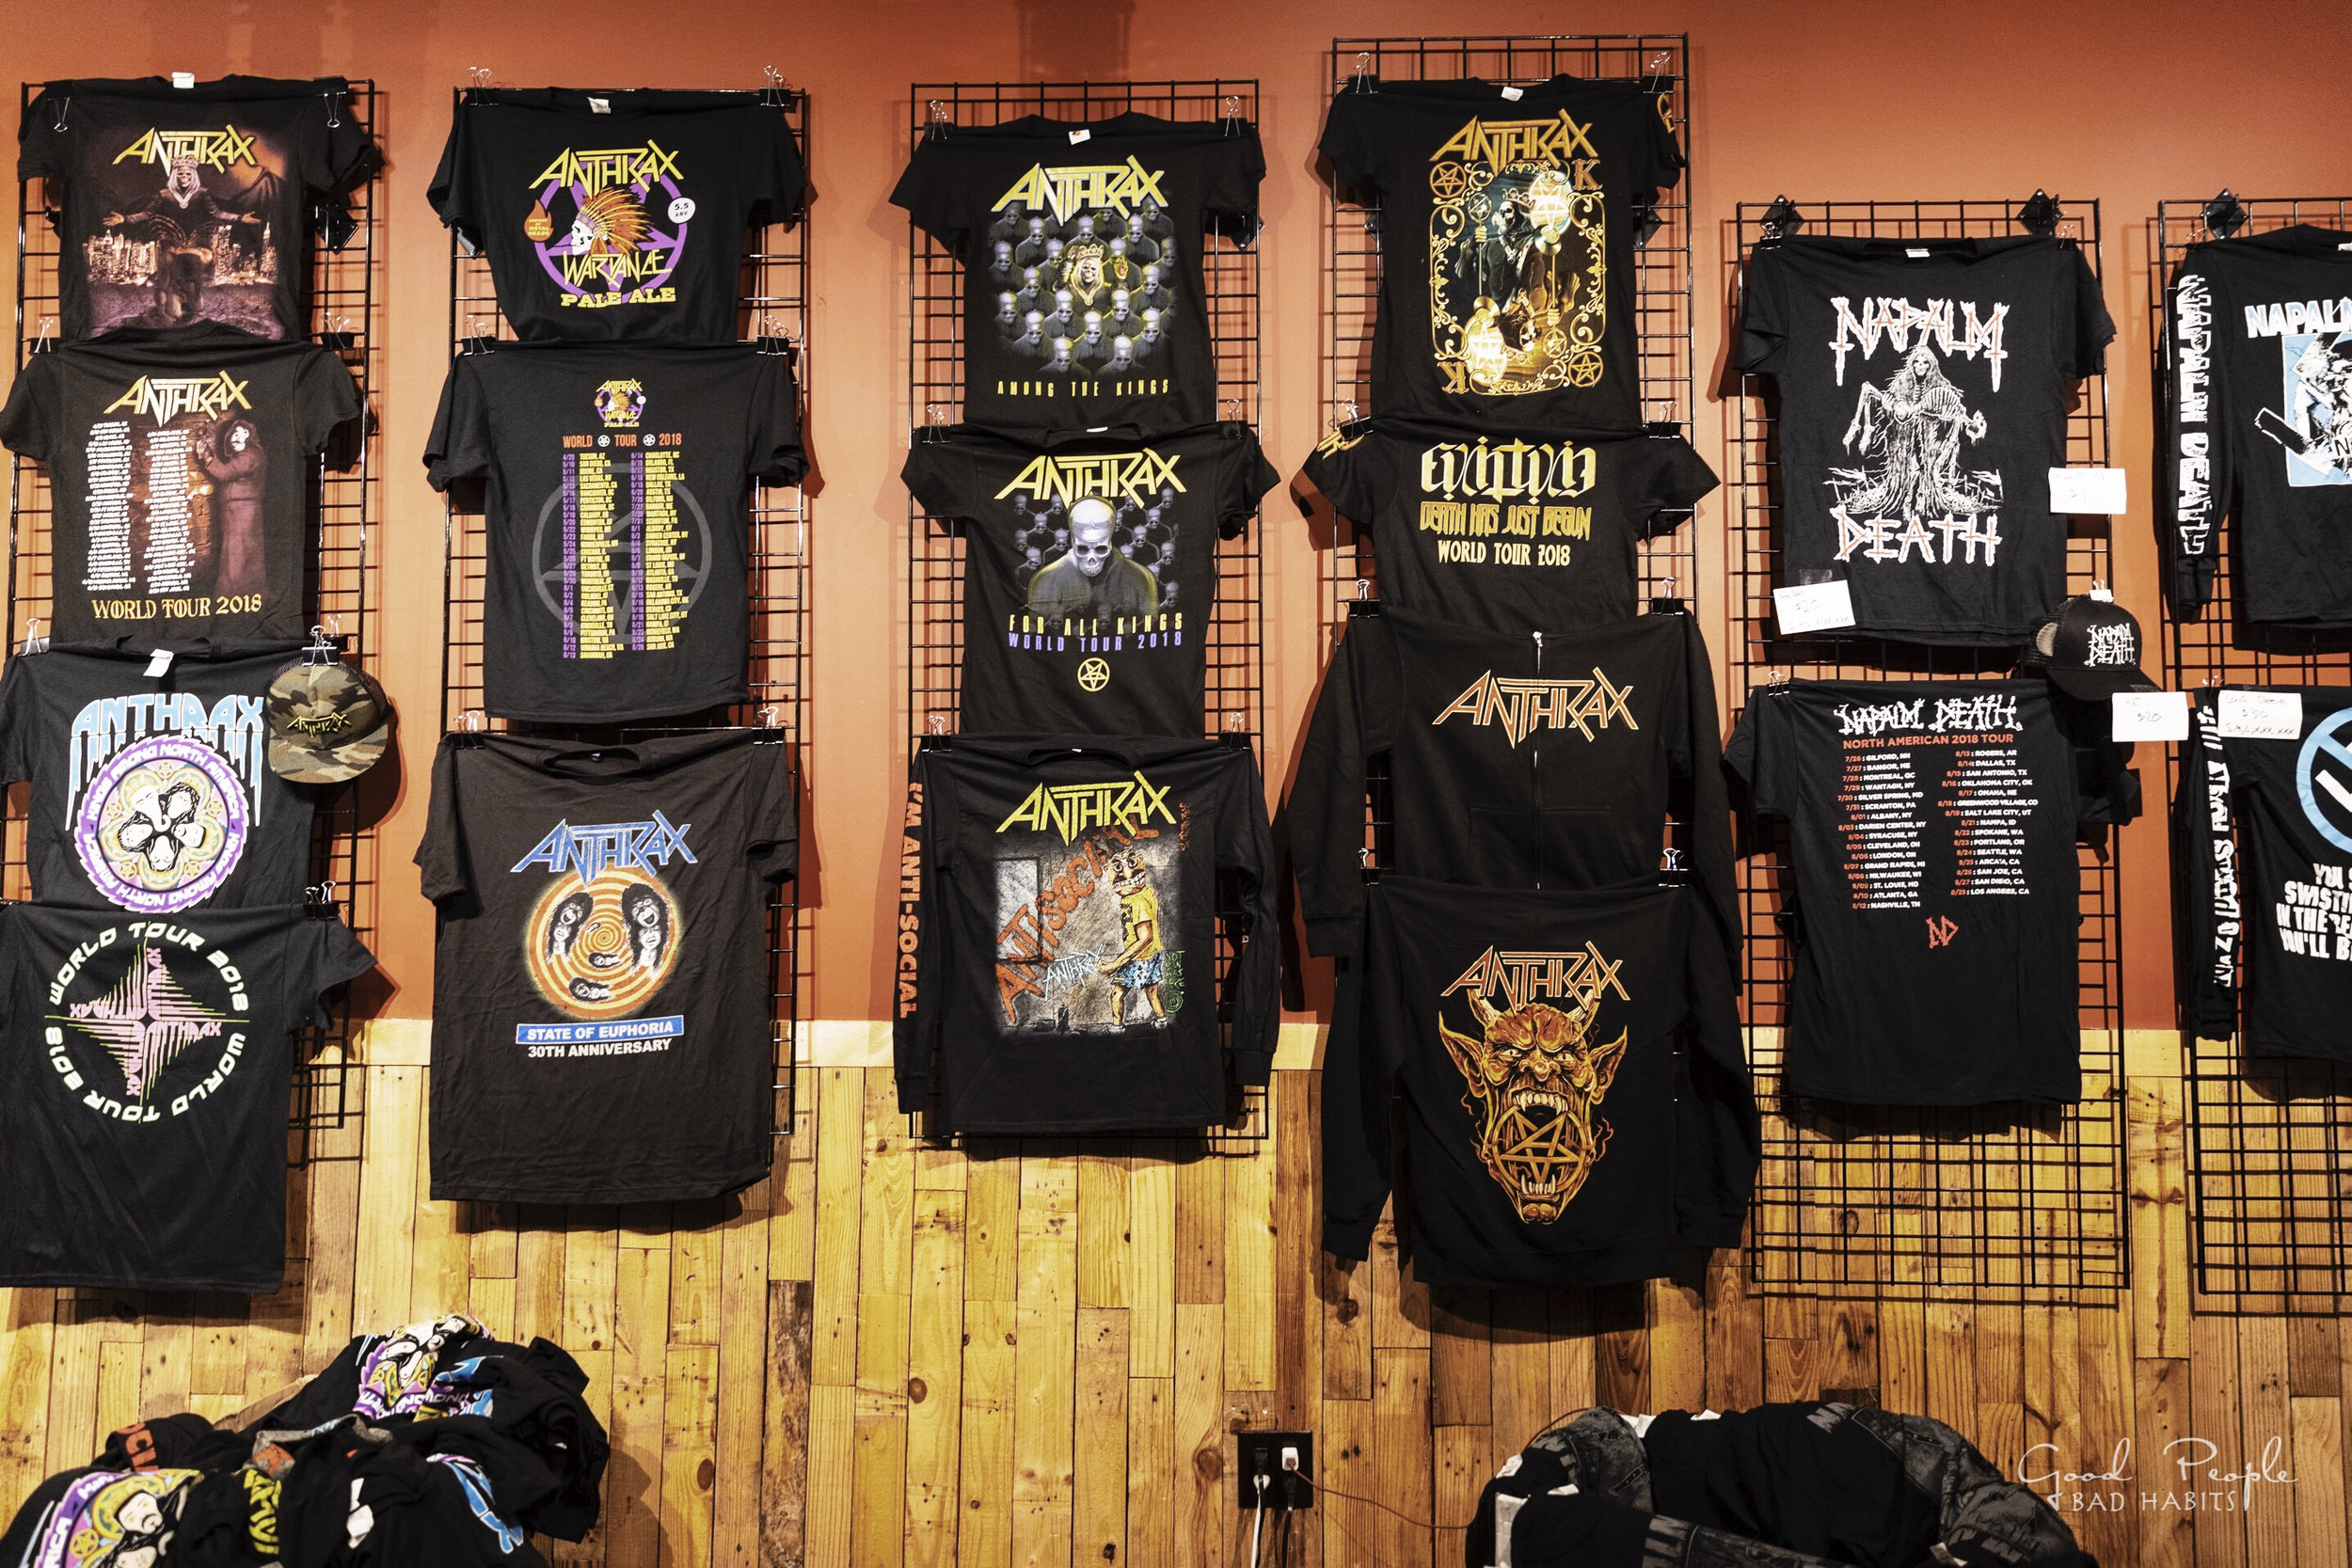 Anthrax_24.jpg